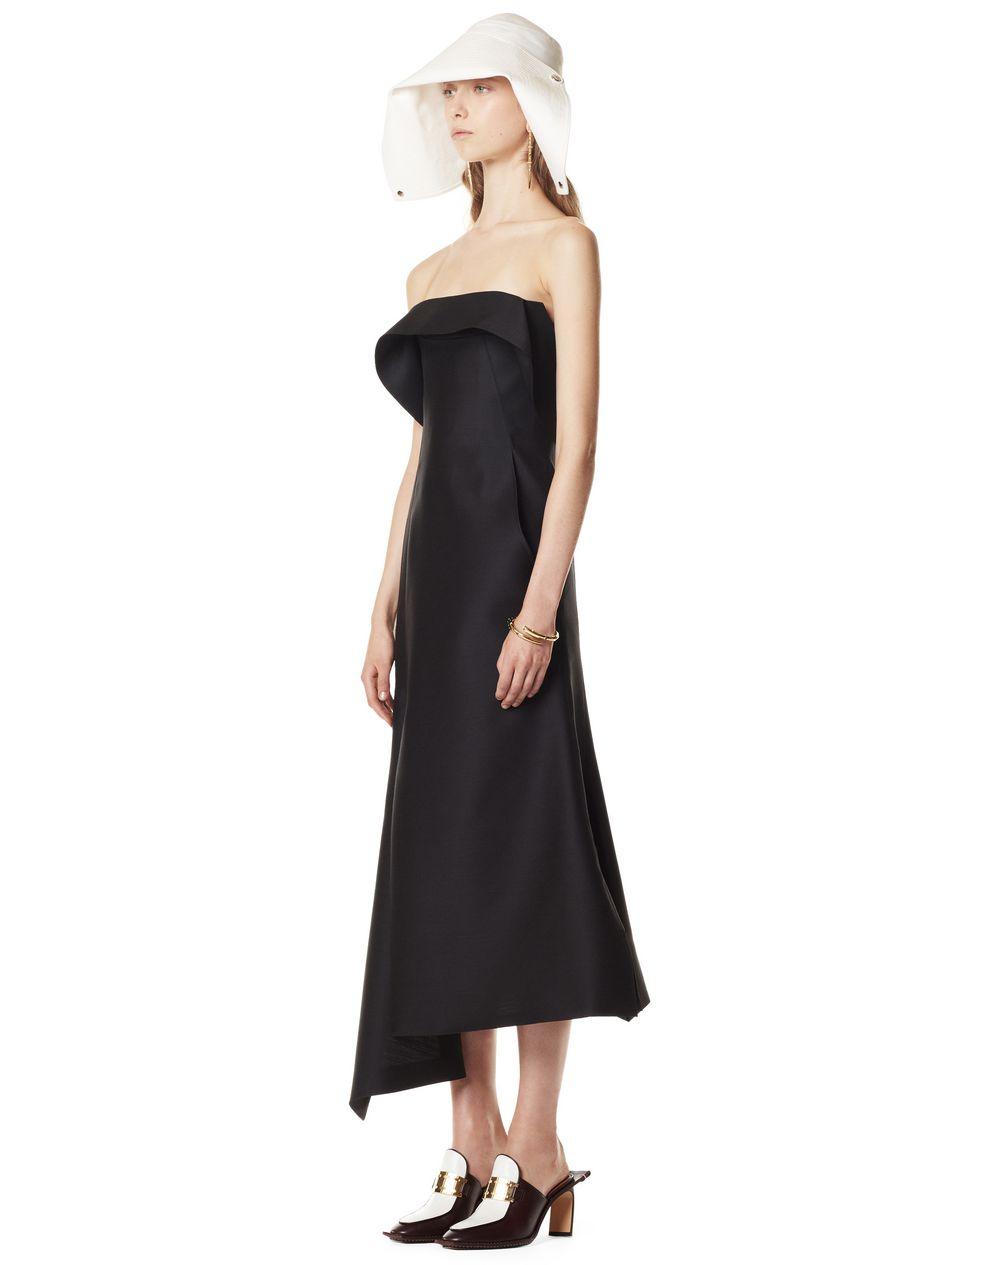 ASYMMETRIC WOOL AND SILK BUSTIER DRESS - Lanvin